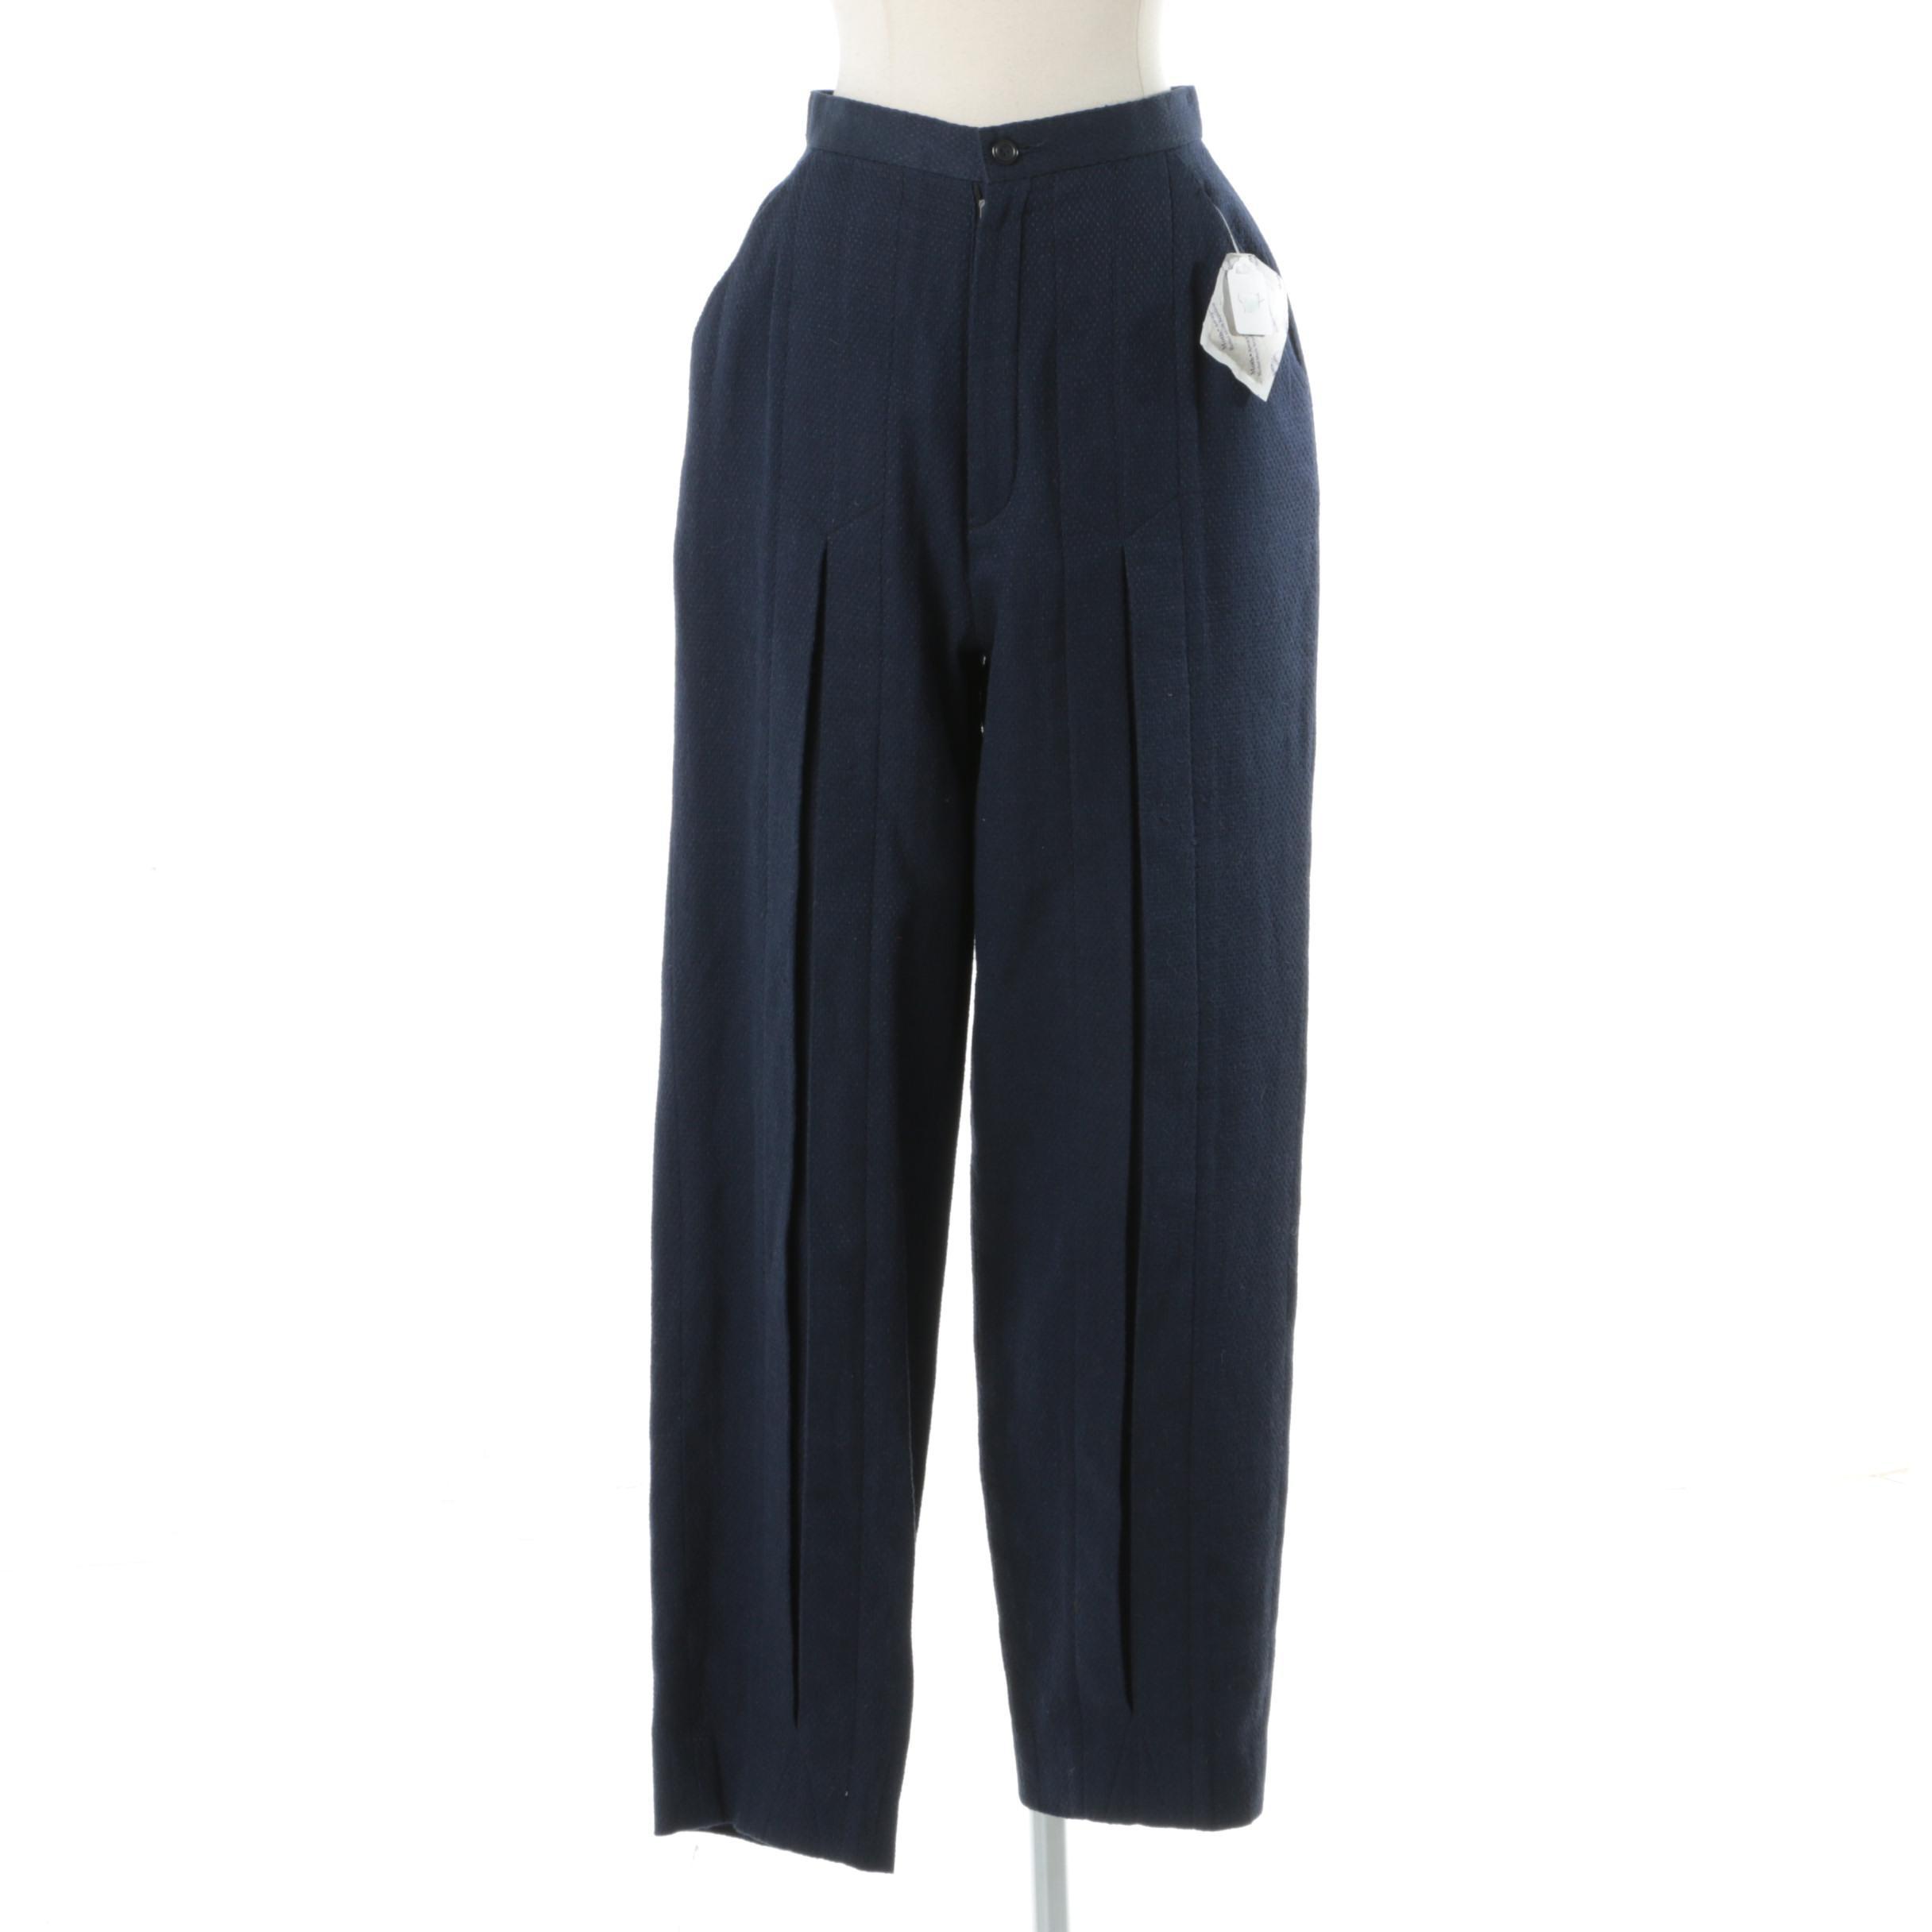 Women's Vintage Issey Miyake Trousers